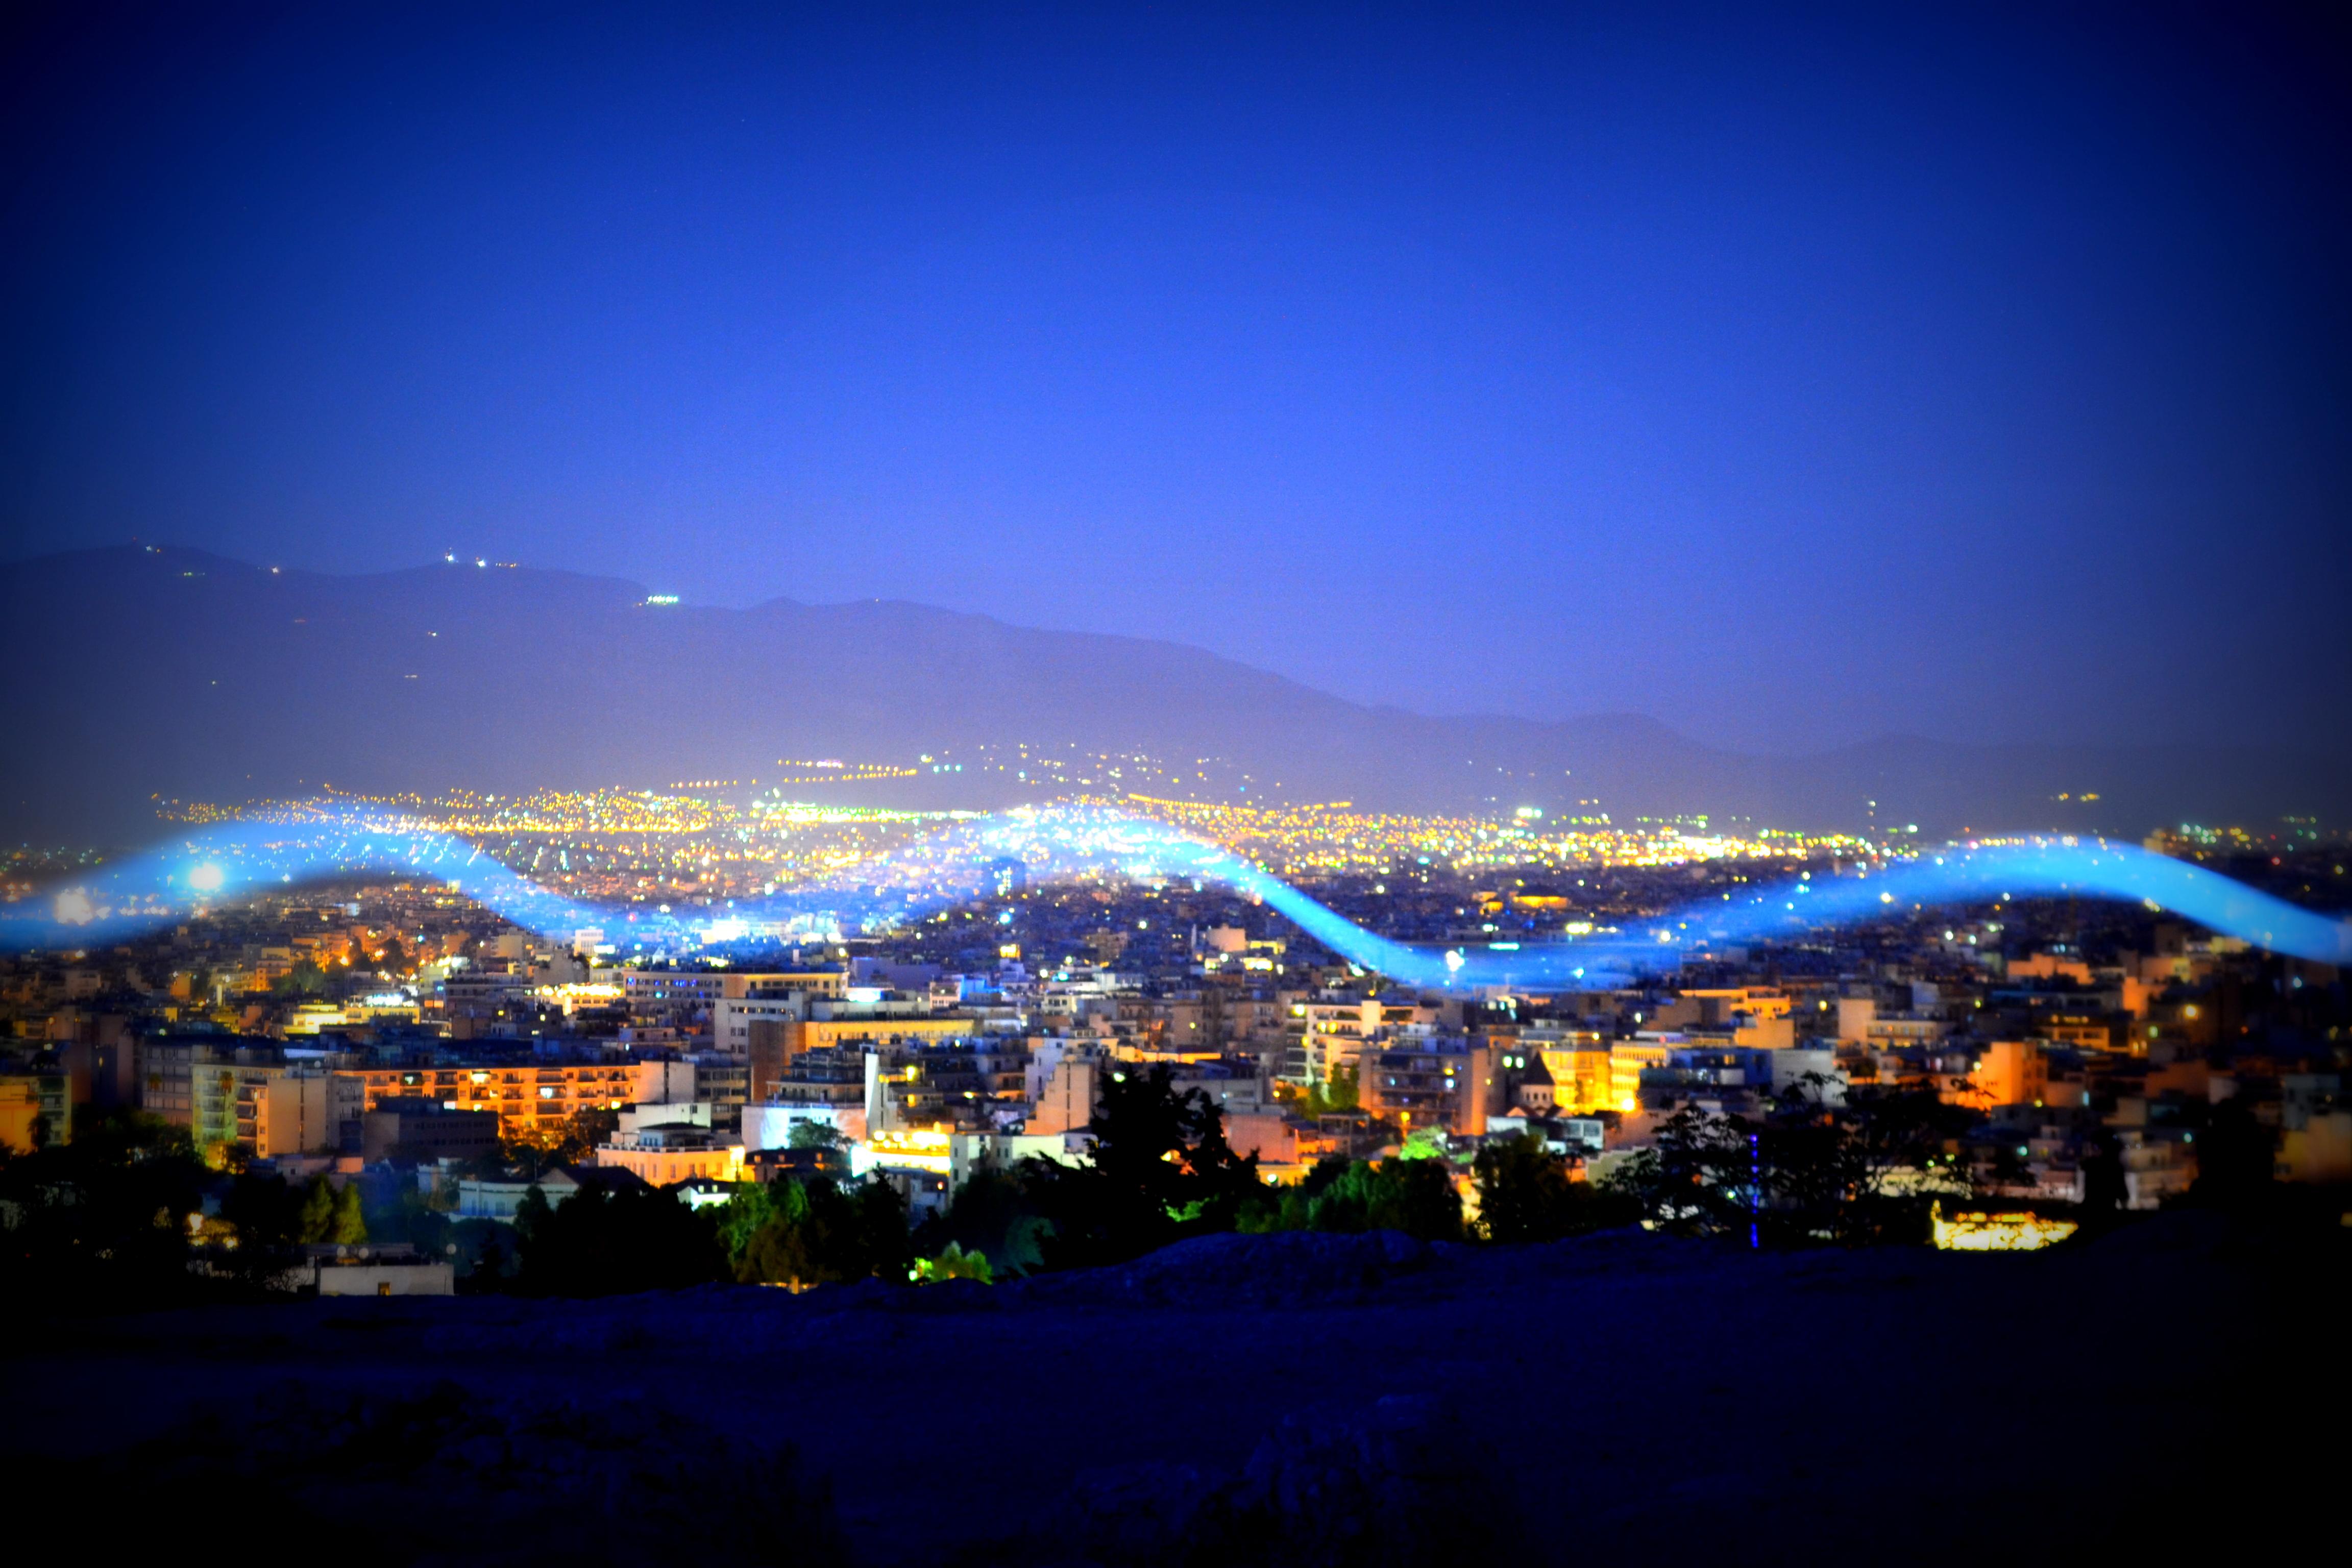 city lights by Neu-Trino